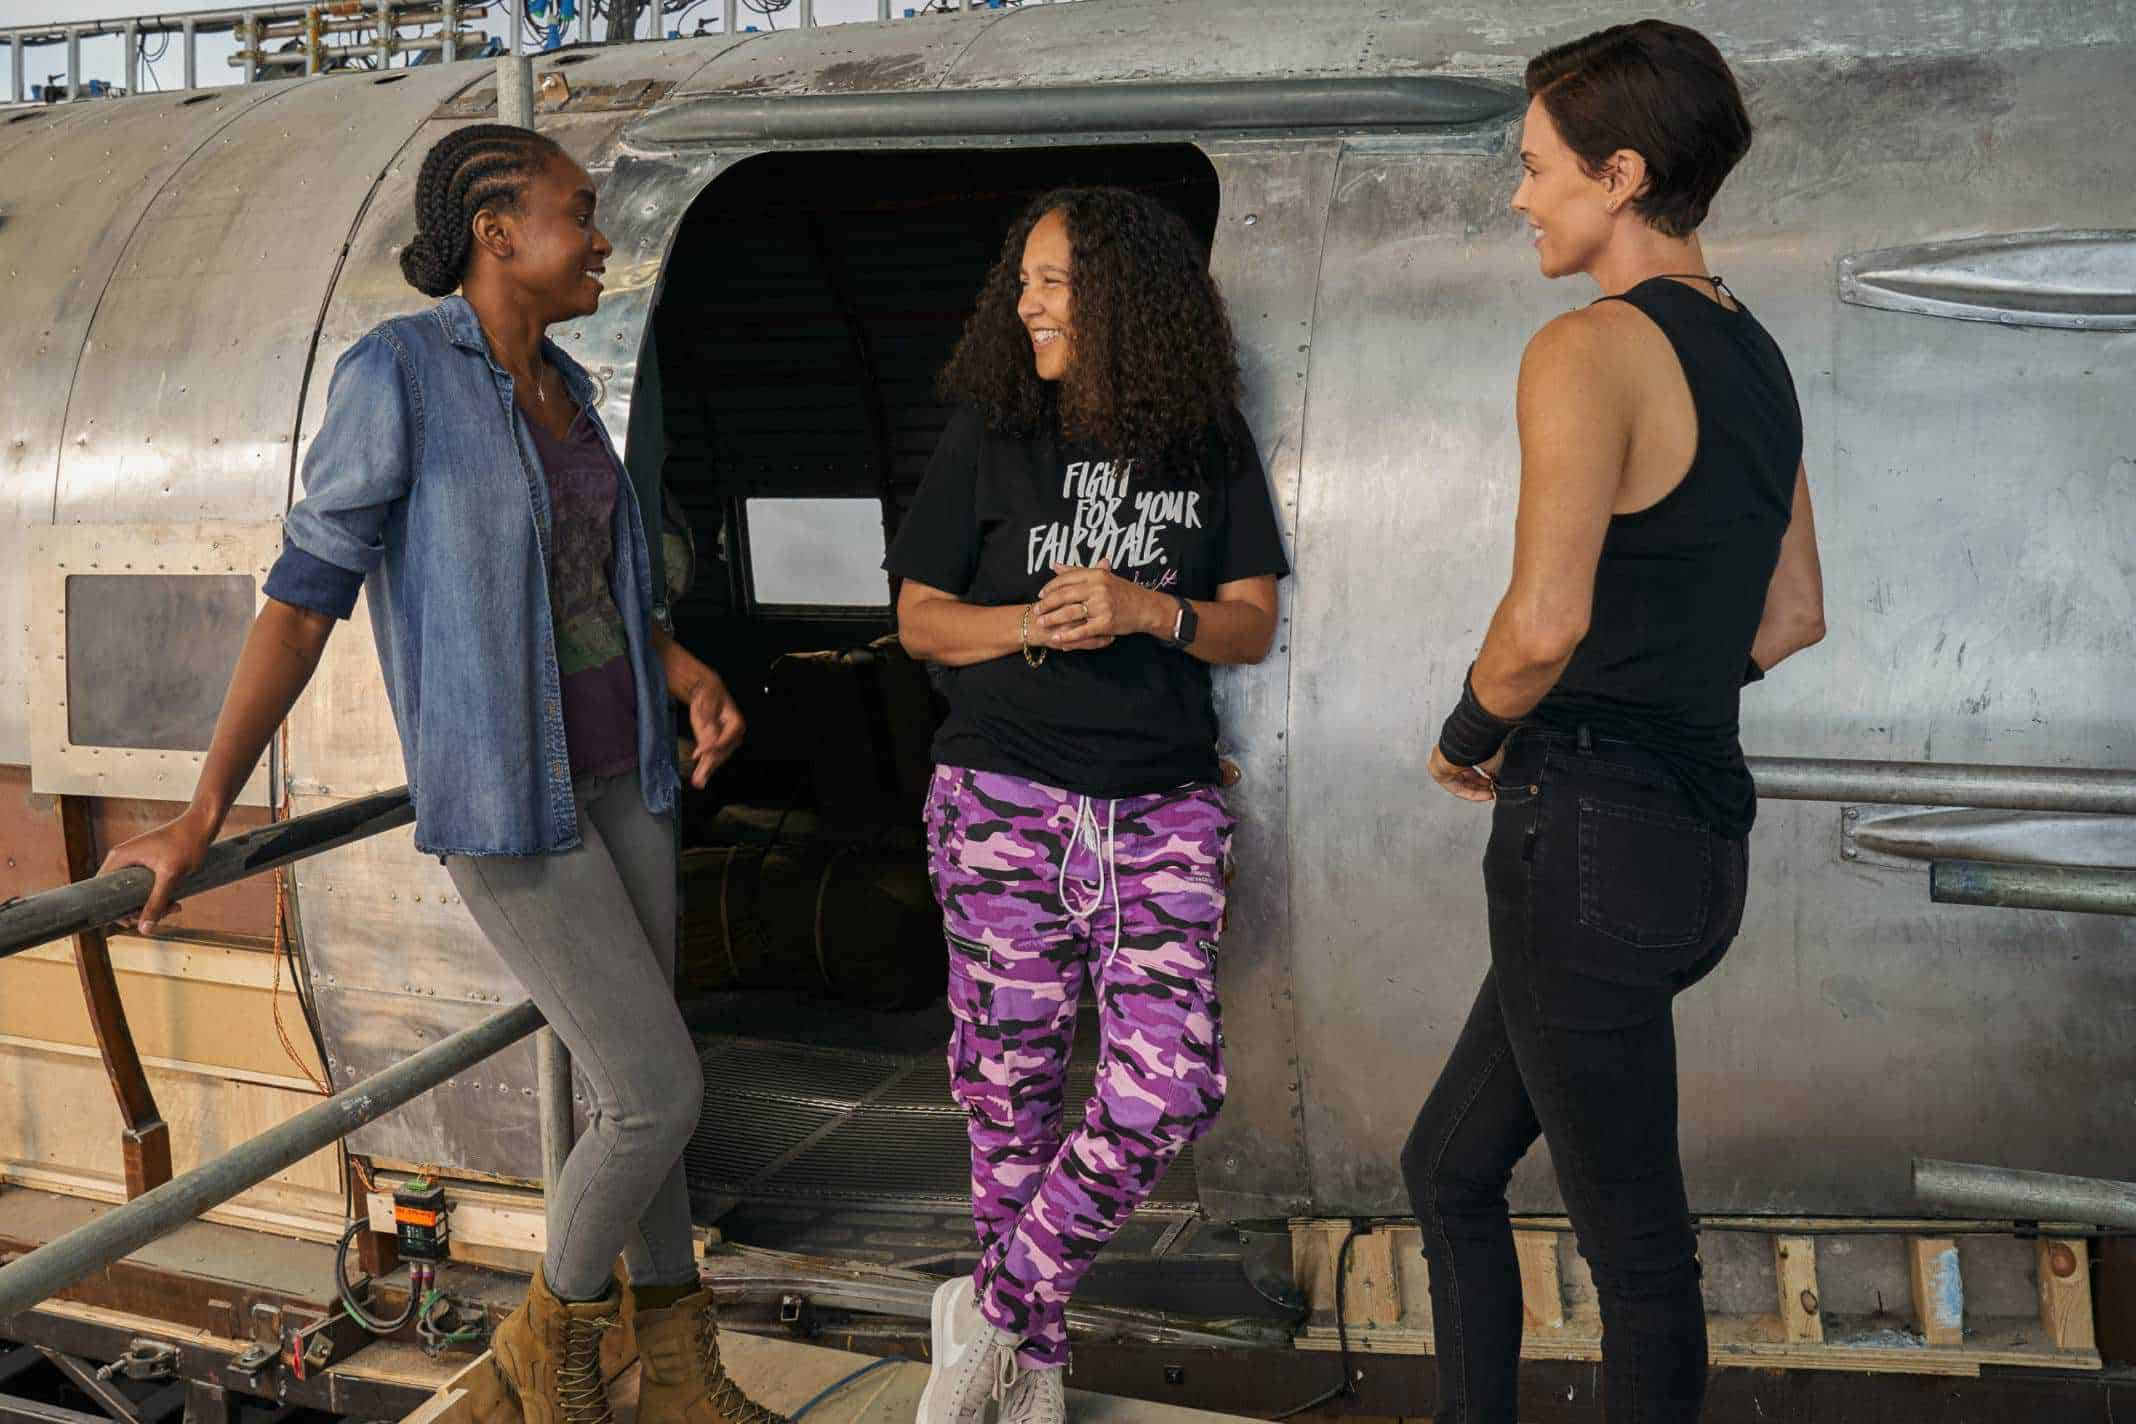 Kiki Layne, Gina Prince-Bythewood and Charlize Theron in conversation.